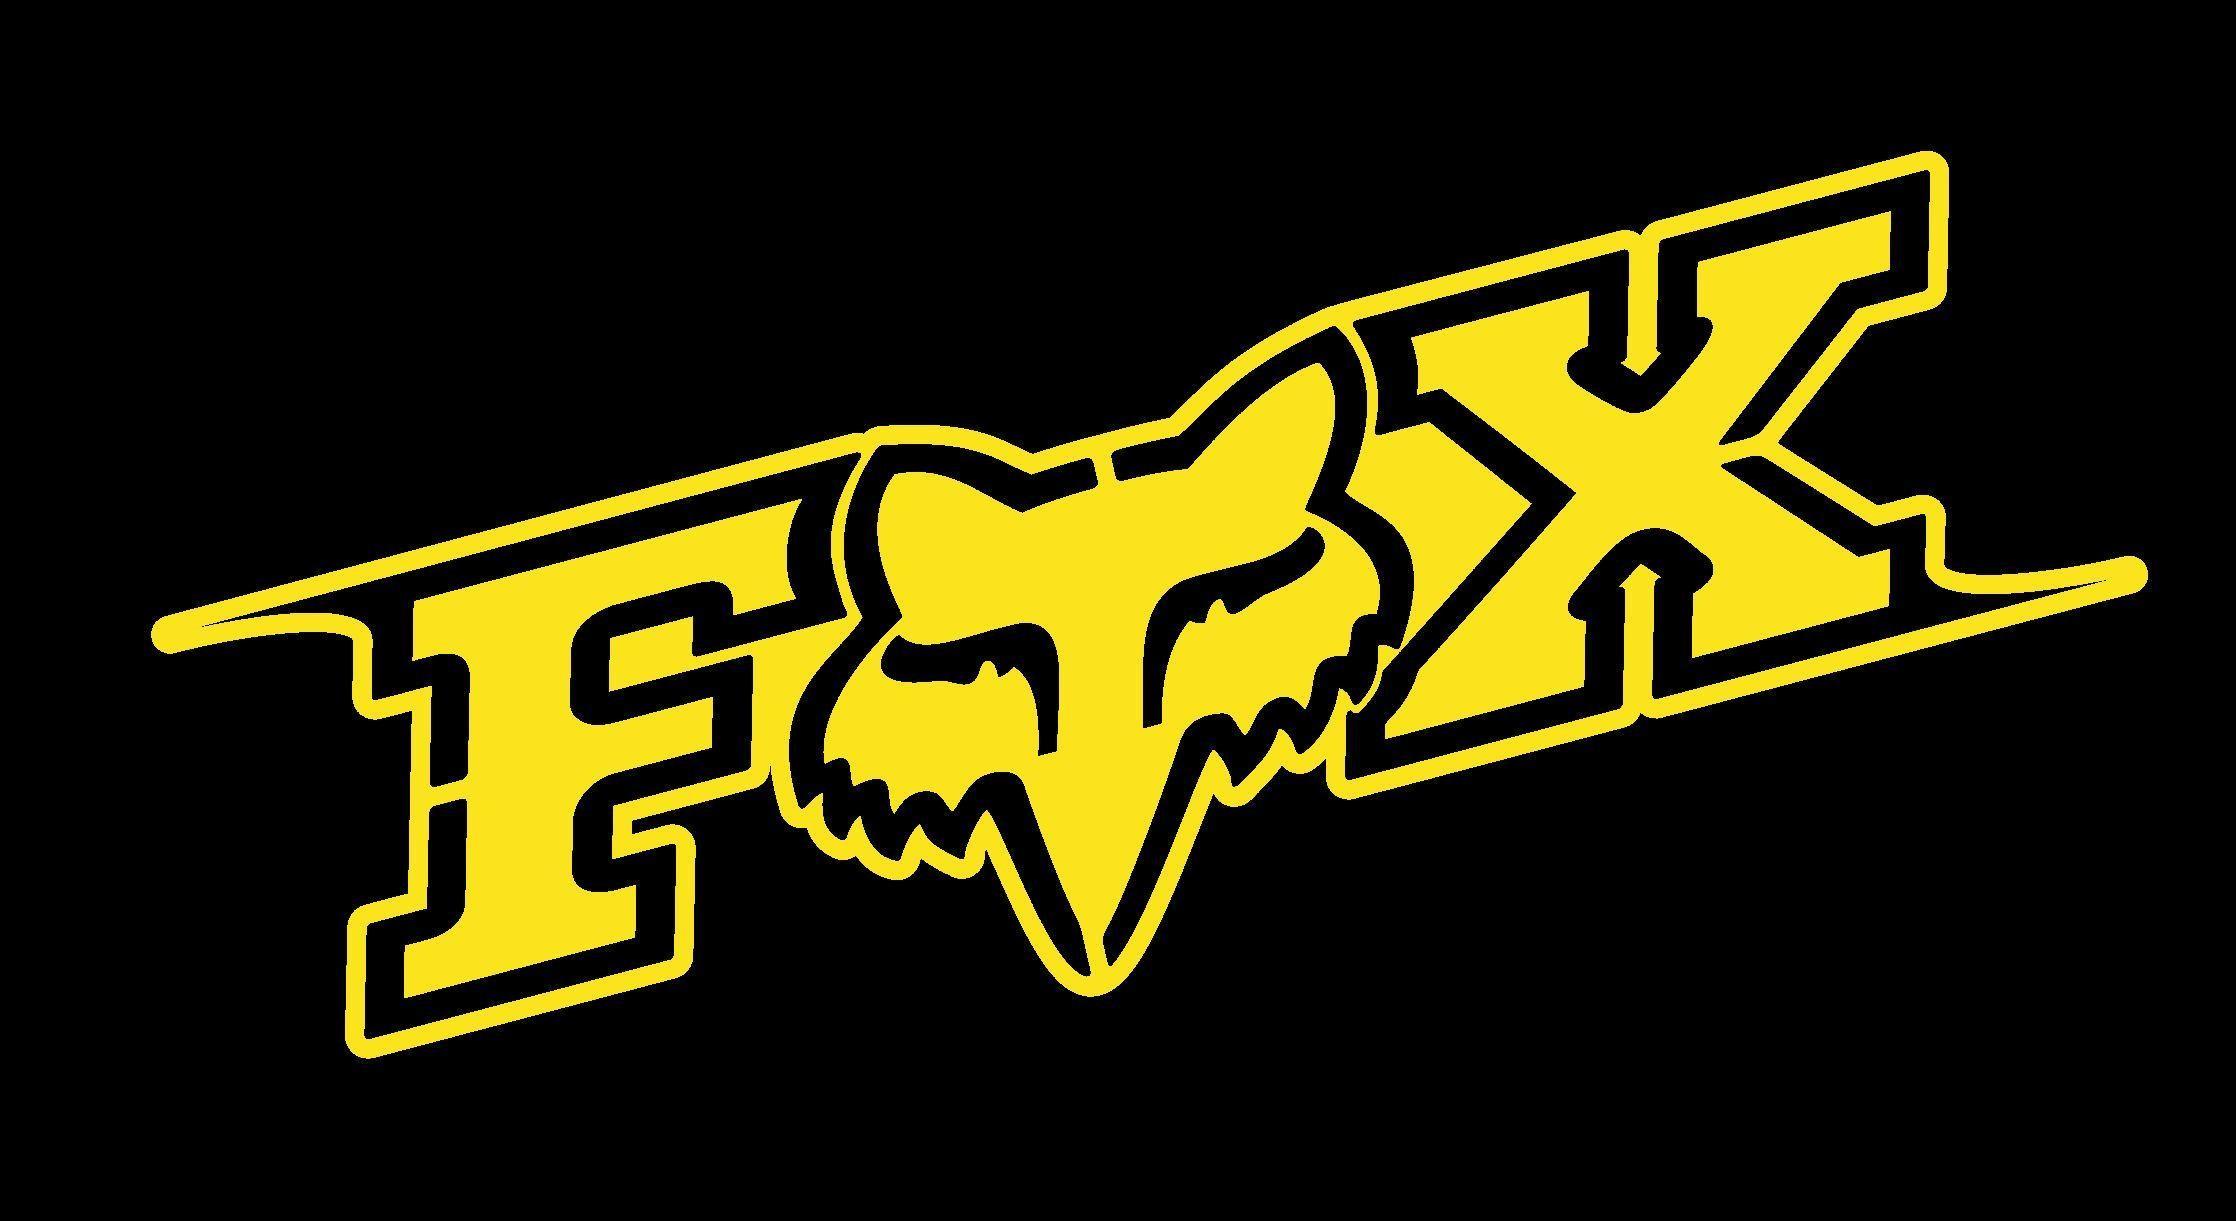 Yellow Fox Racing Wallpaper | Paravu.com | HD Wallpaper and .